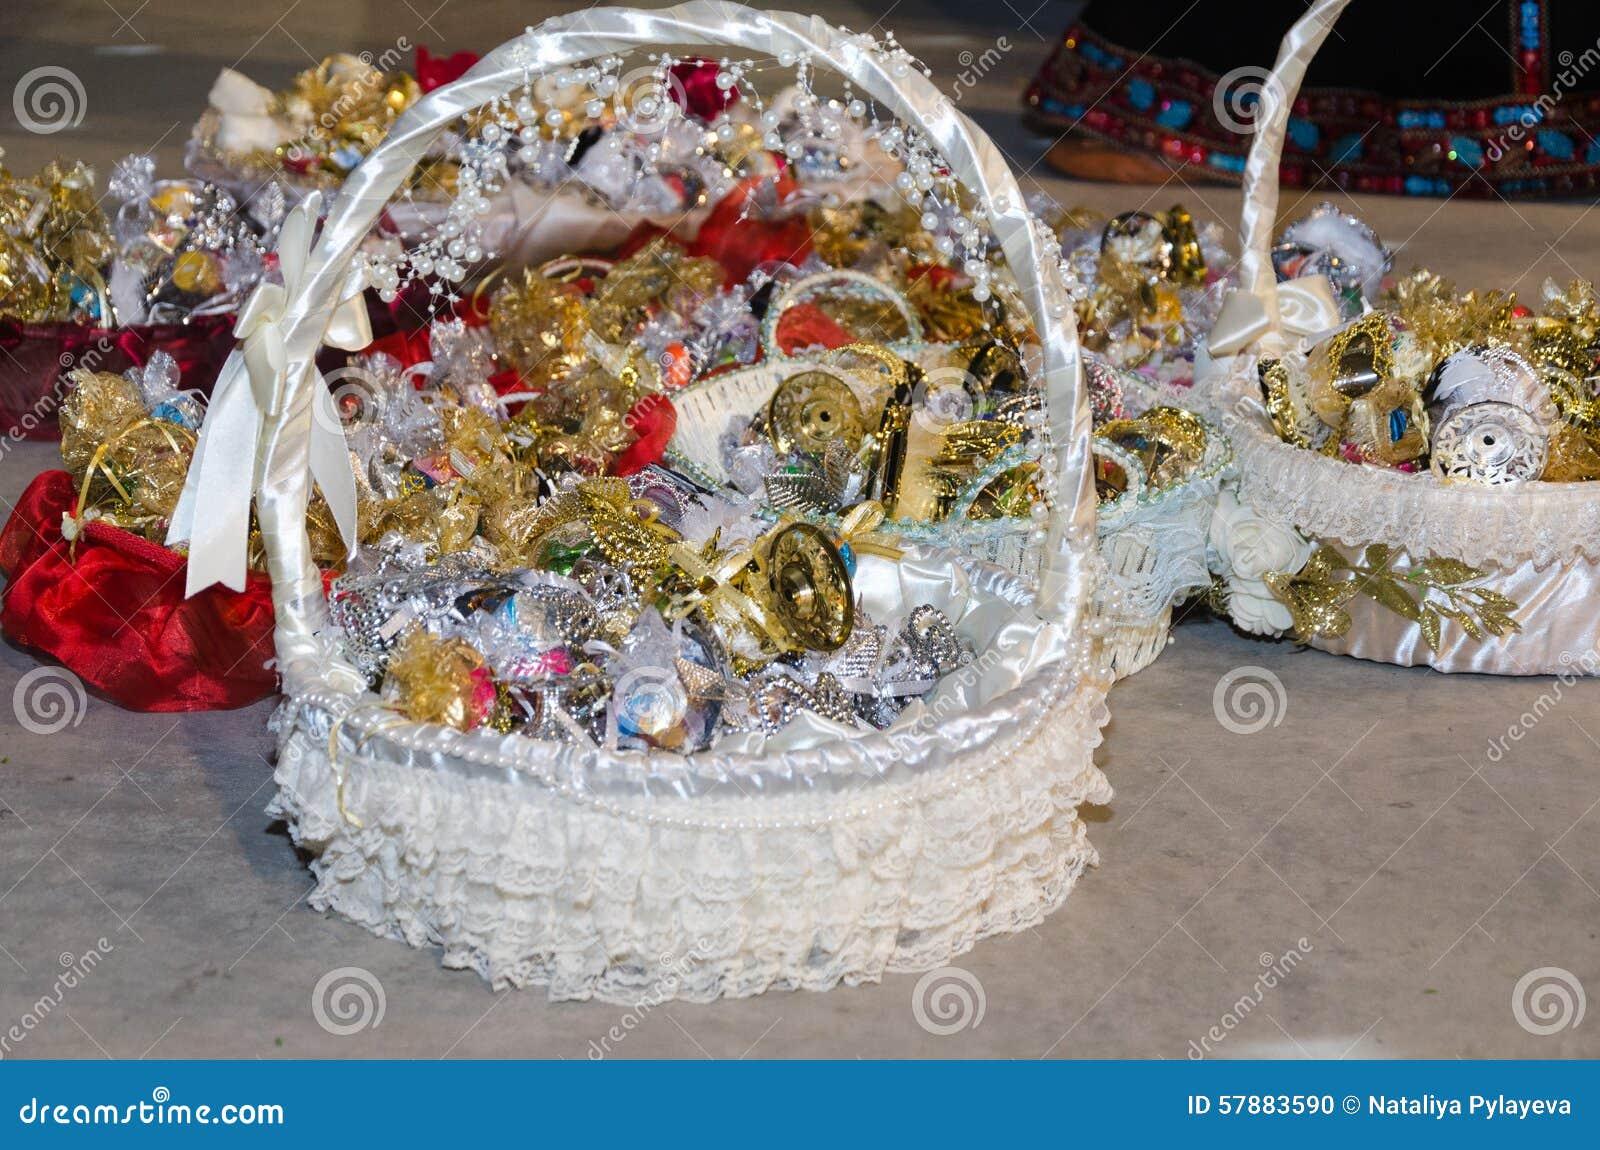 Berühmt Panier cadeau mariage musulman – Blog photo de mariage en 2017! RB71